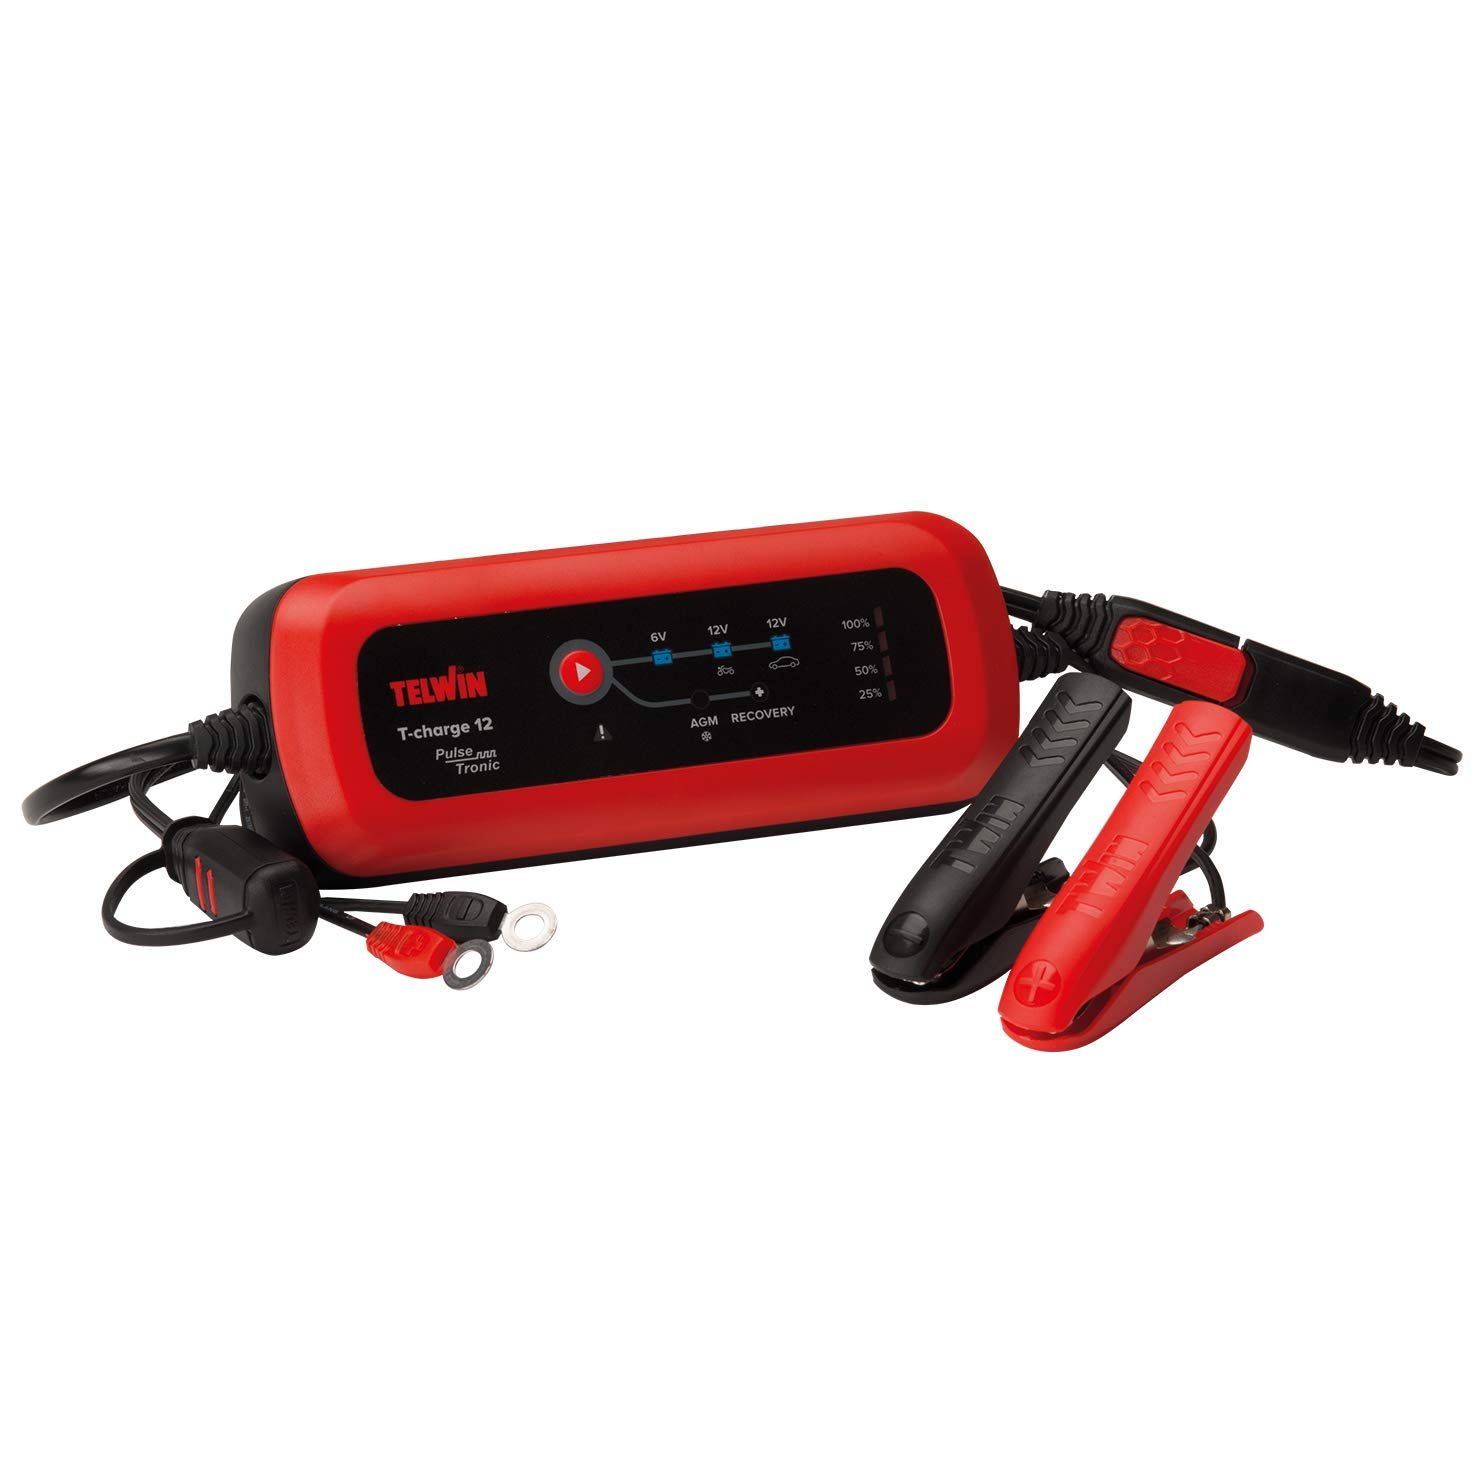 Rosso Telwin 807567 T-Charge 12 Caricabatterie e Mantenitore Elettronico 6//12V